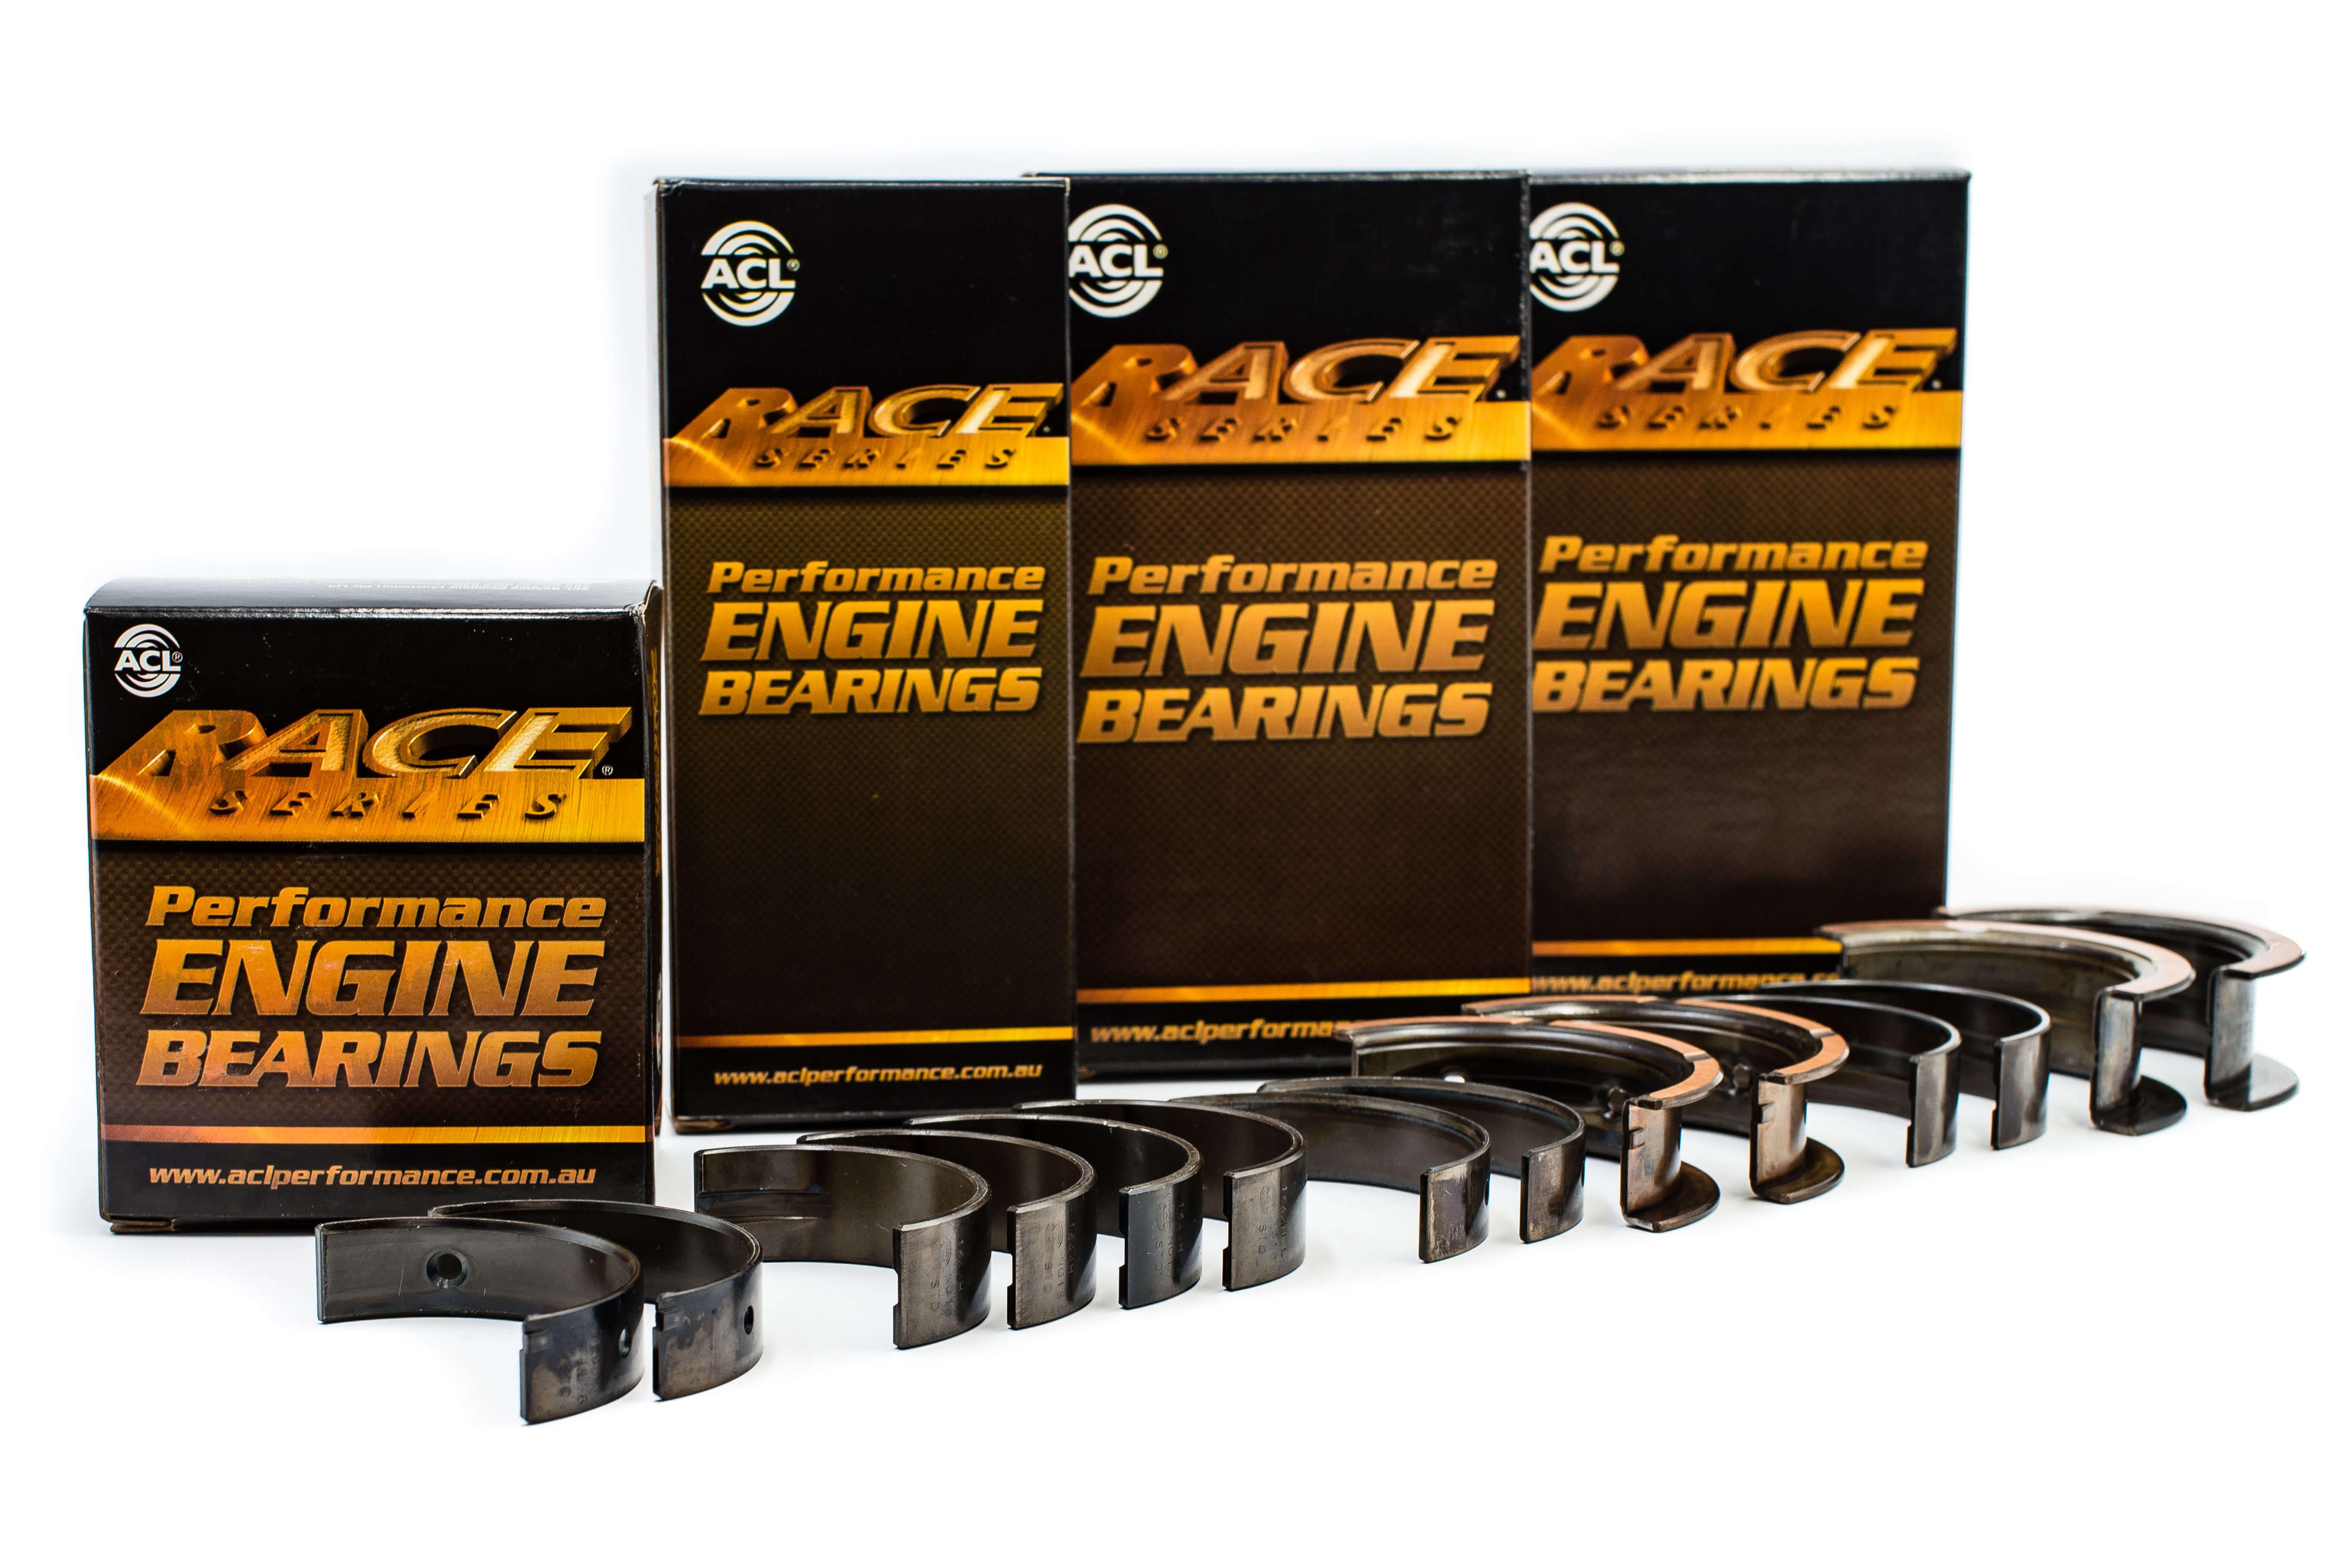 ACL - Main Bearings - BMW M20, M50, M52, M54